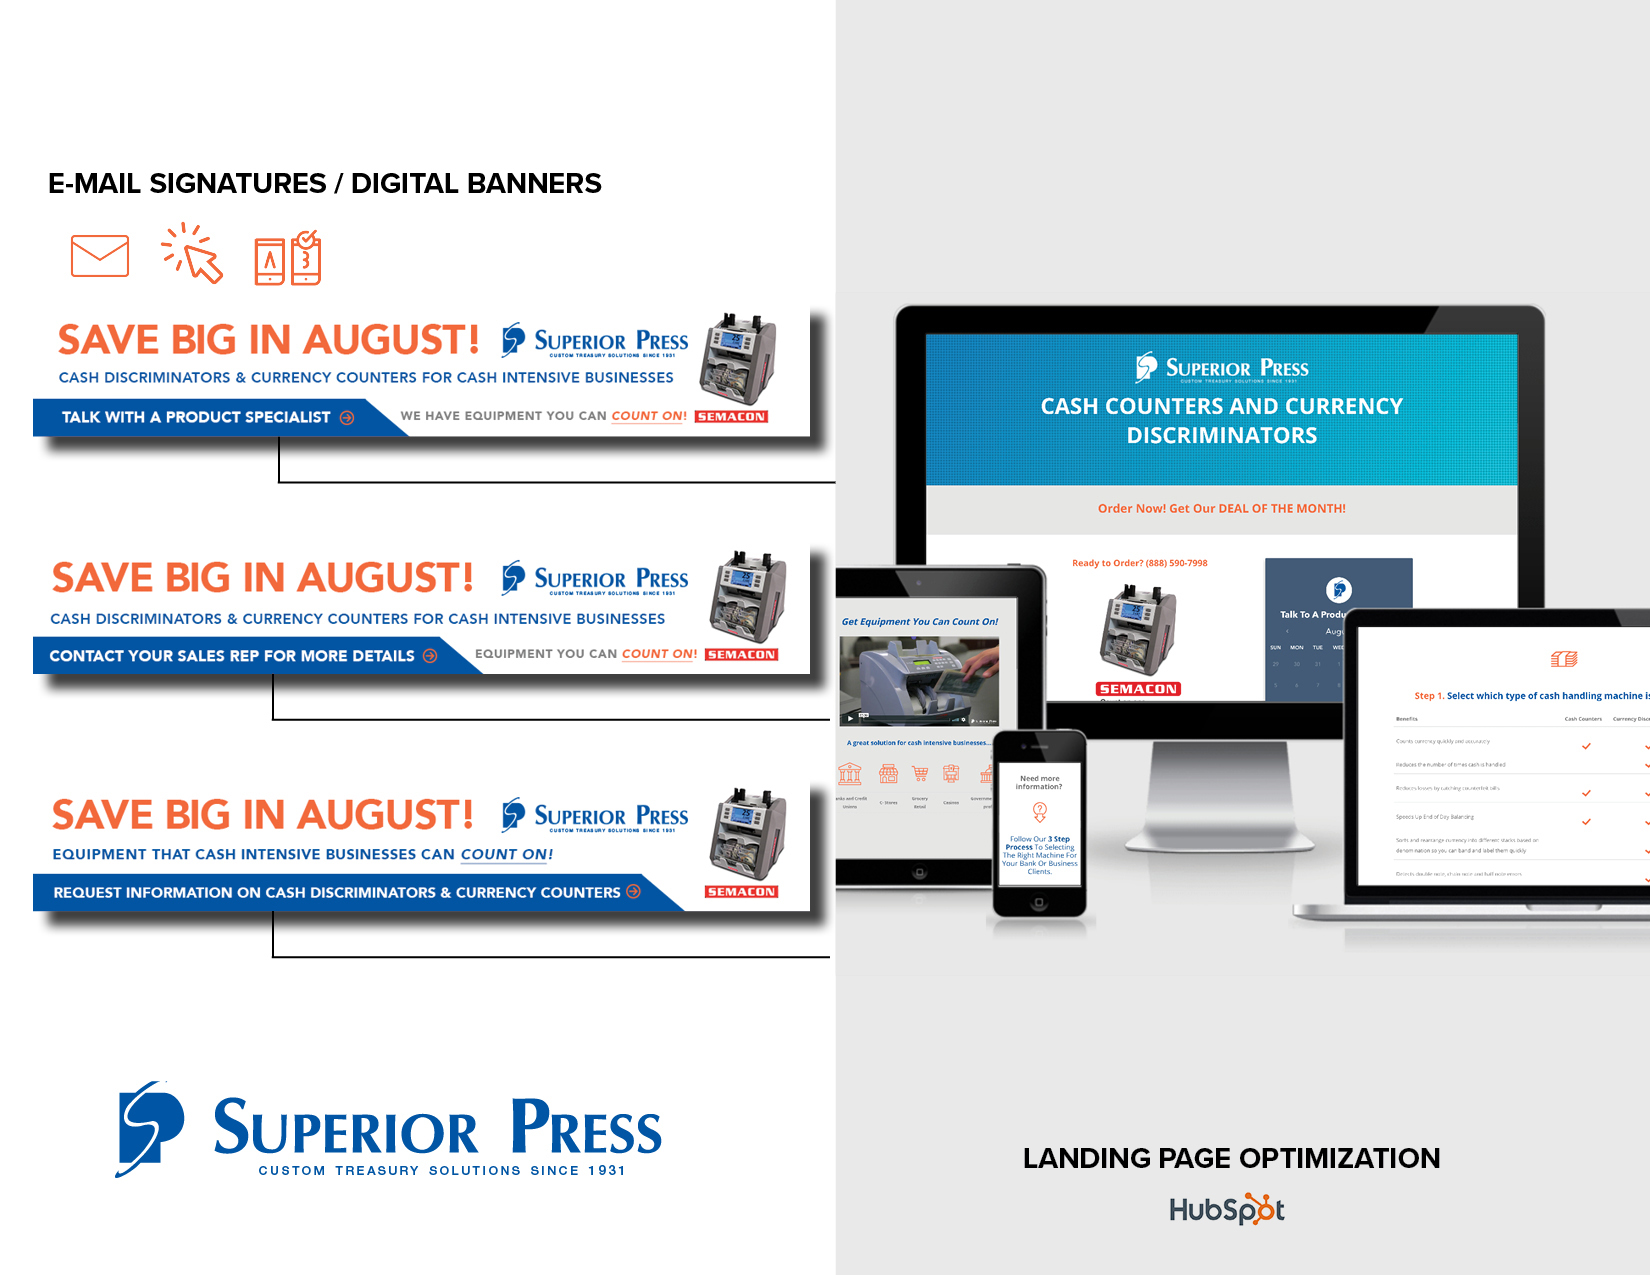 Landing Page & Digital Marketing Campaign - Hubspot Landing Pages PlatformCopywritingCSS/HTMLUX/UI OptimizationLeaderboard Ad Design